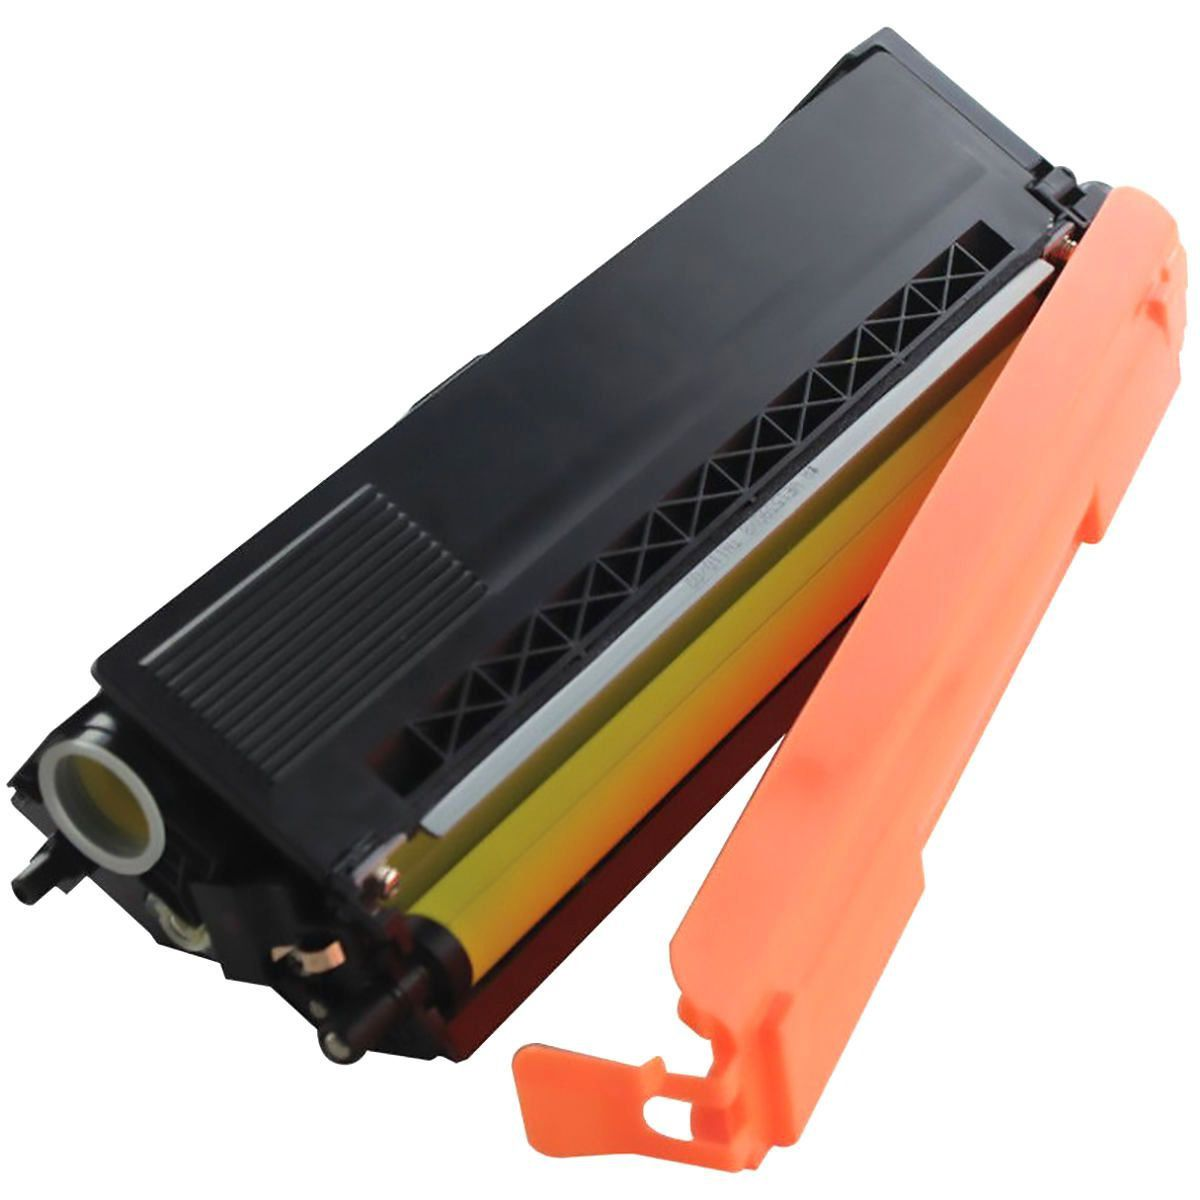 Compatível: Toner TN-310 TN-315 para Brother HL-4150cdn HL-4570cdw MFC-9560cdw MFC-9460cdn 9970cdw / Amarelo / 3.500